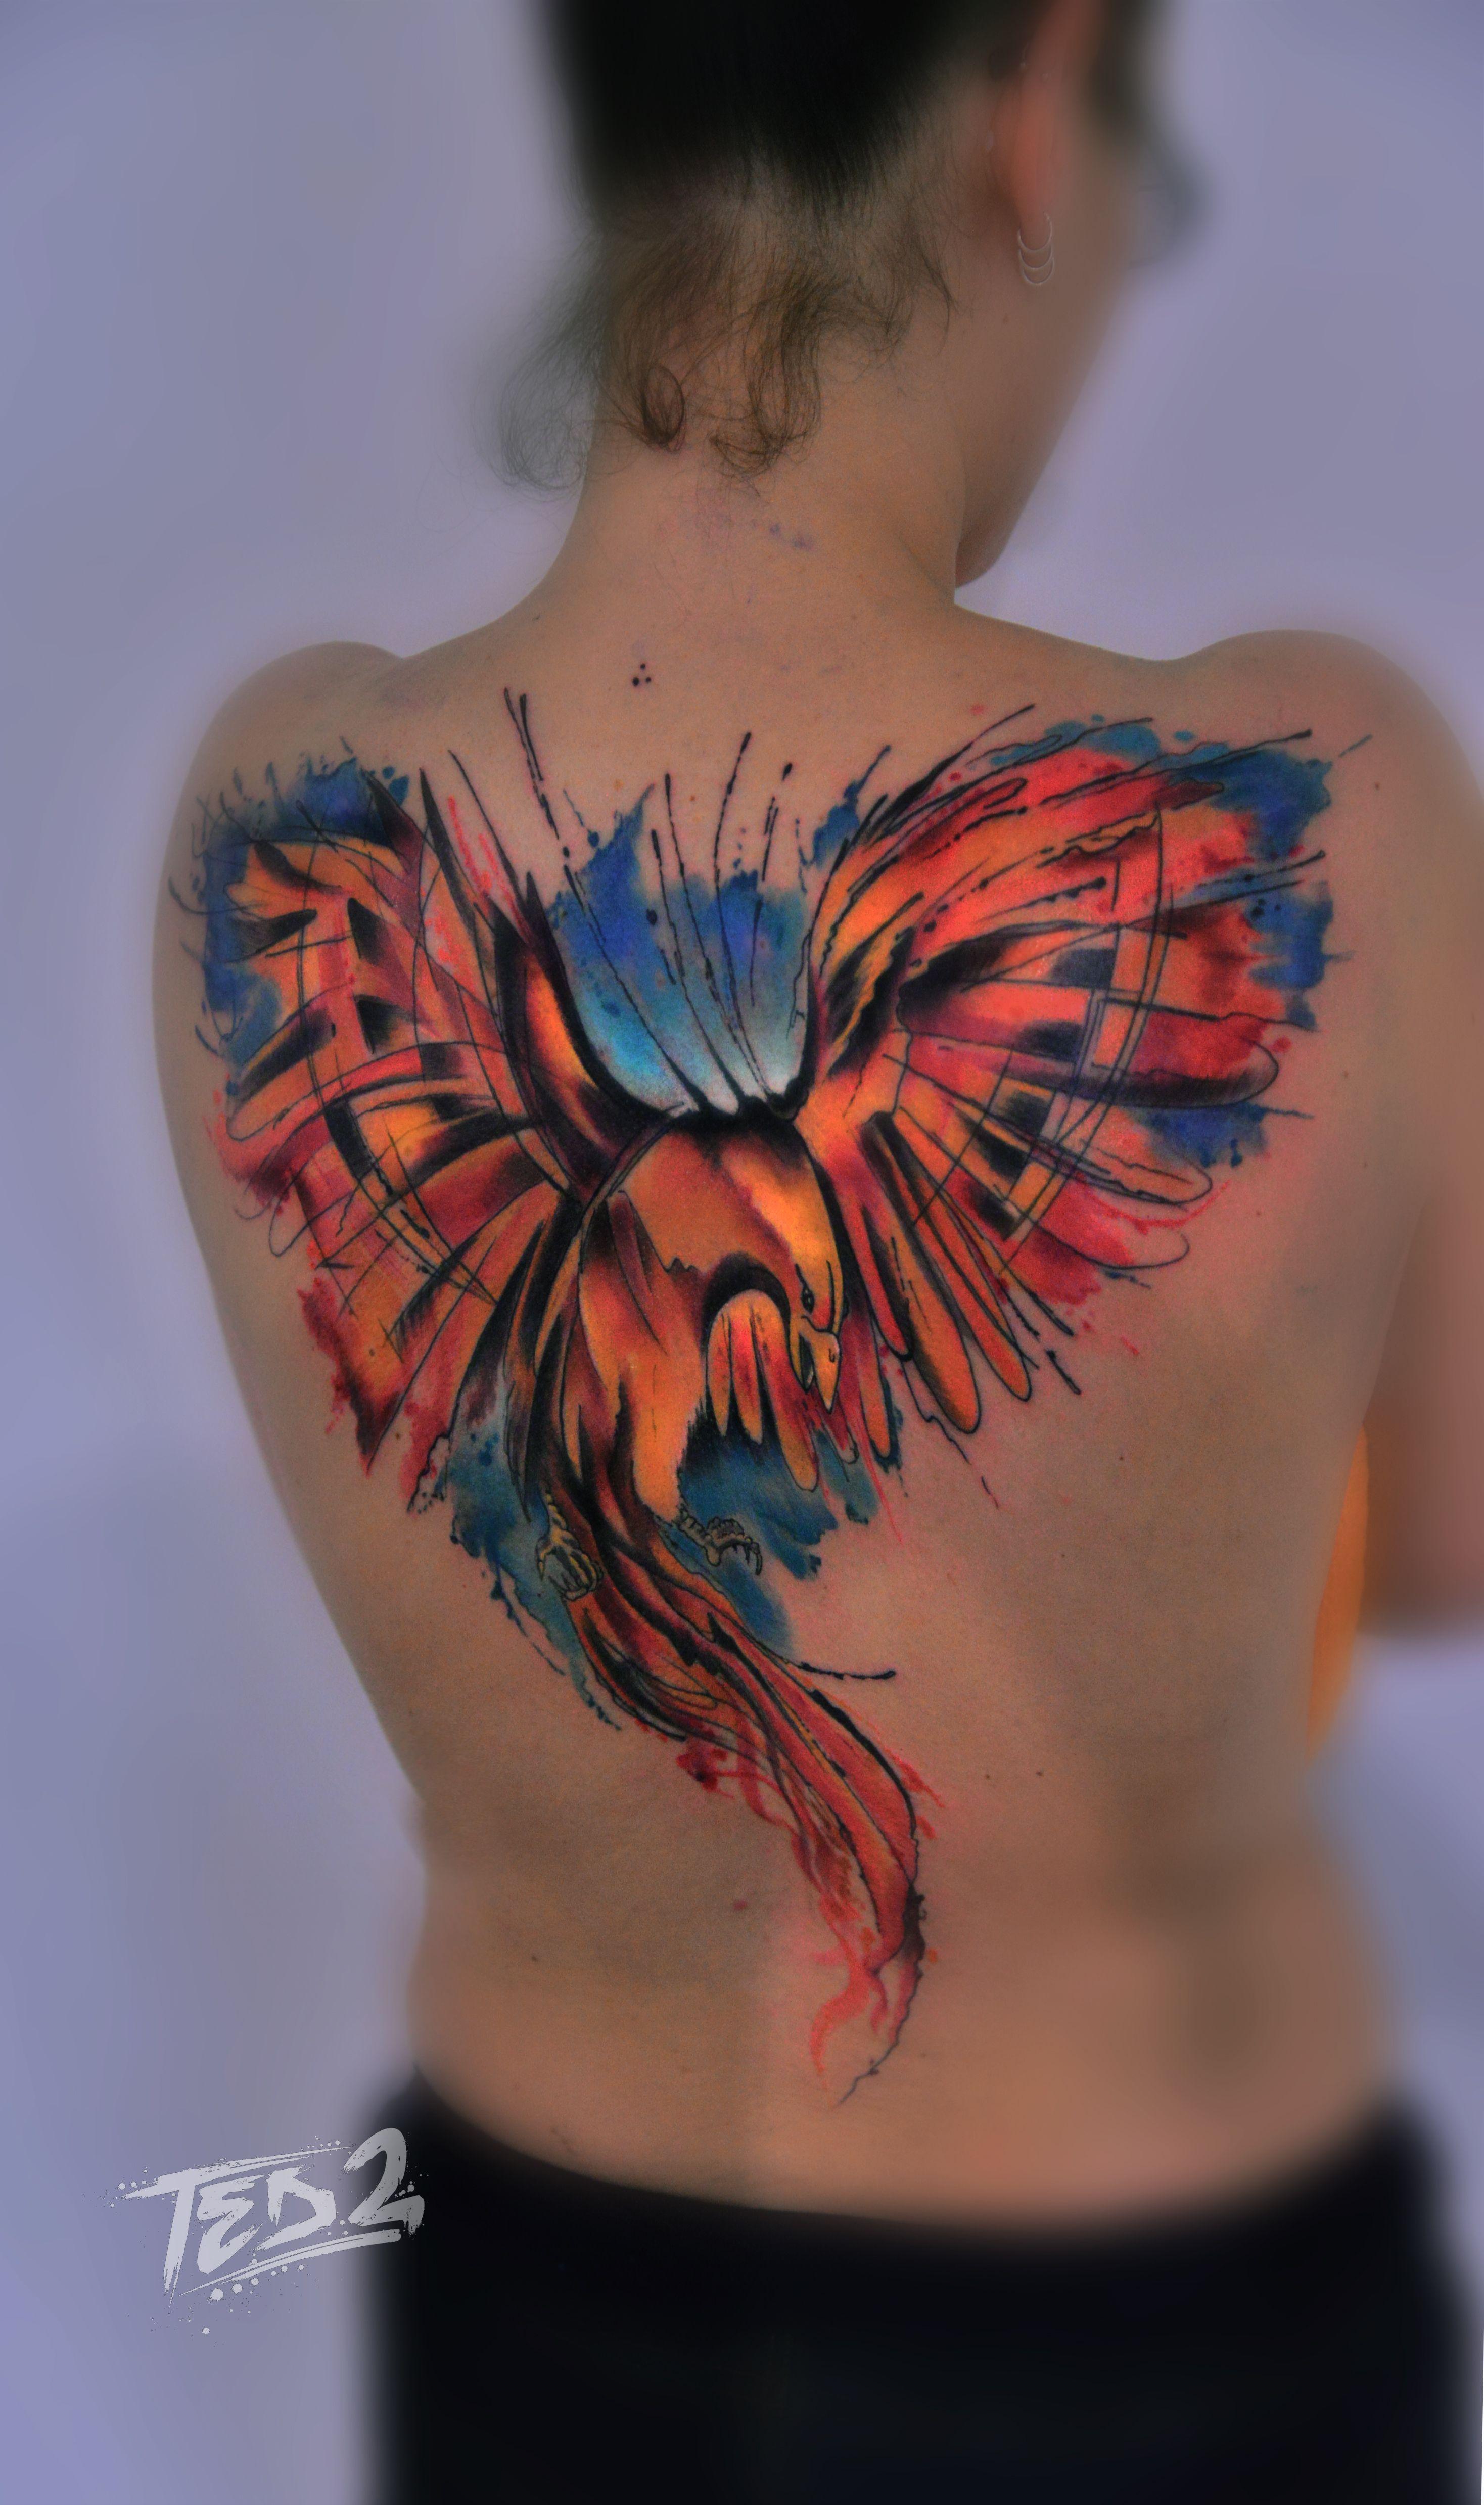 Watercolor Phönix,Watercolour phönix,phonix,Fönix,phoenix